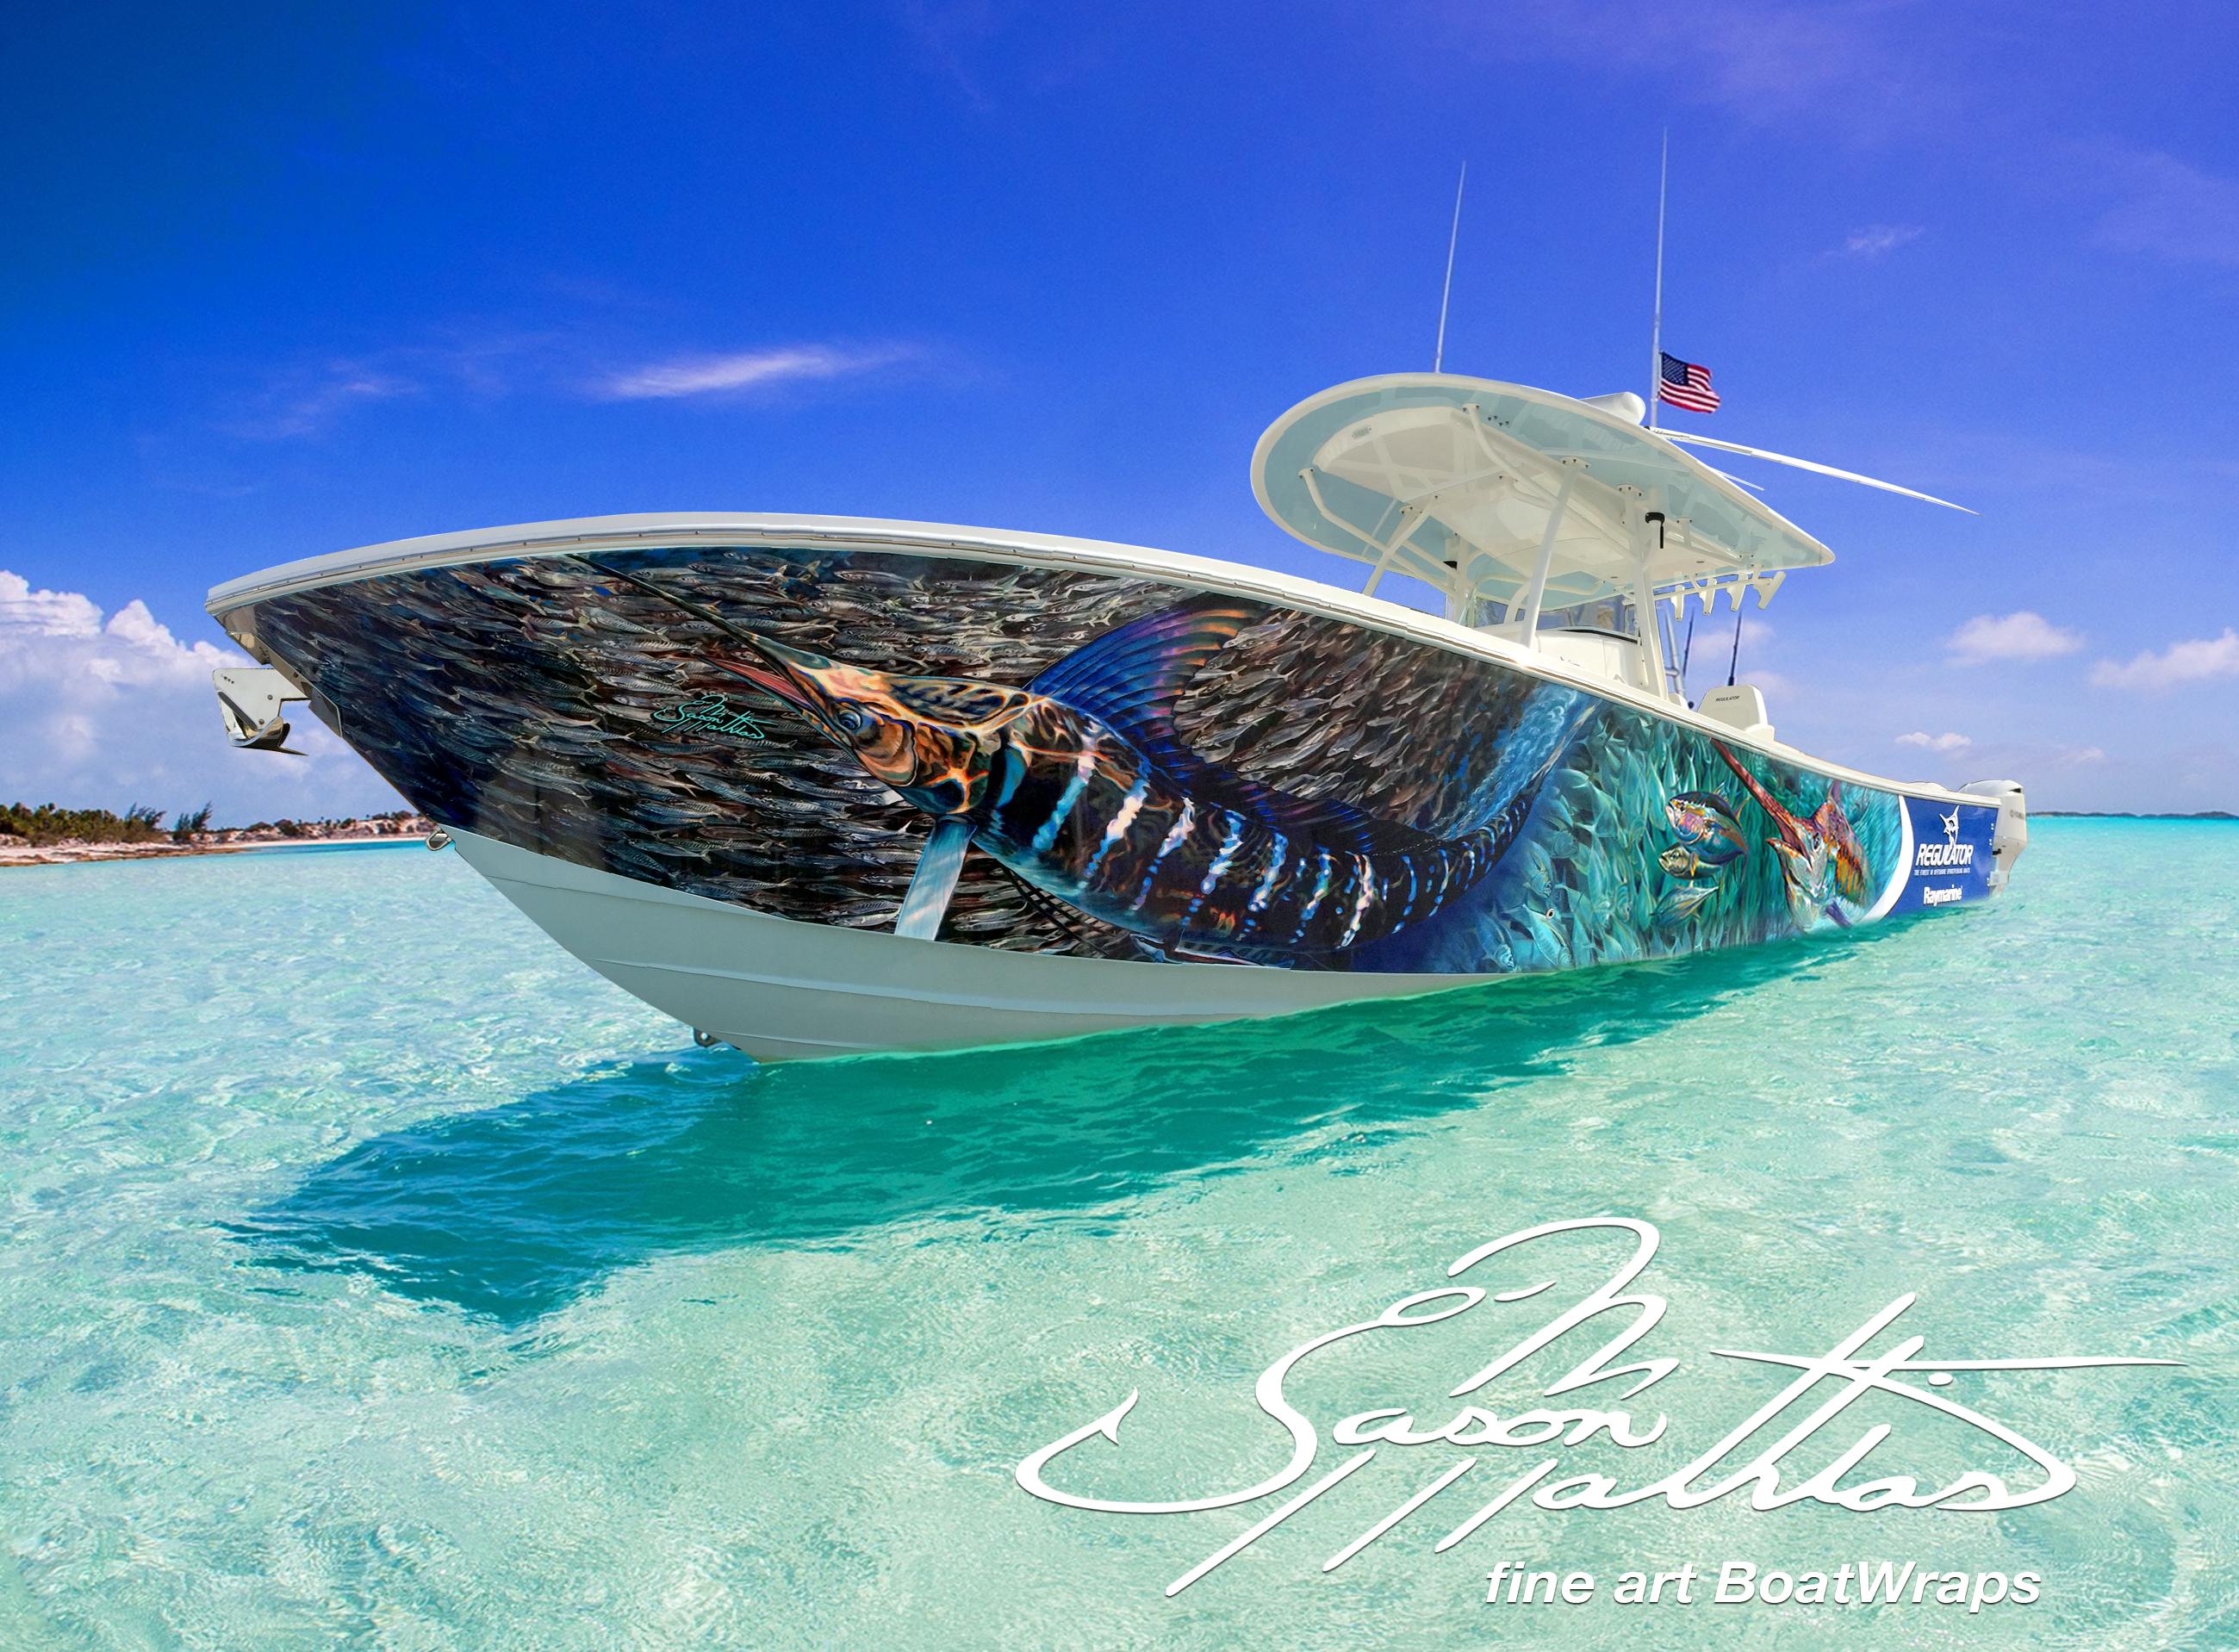 jason-mathias-boat-wraps-marlin.jpg